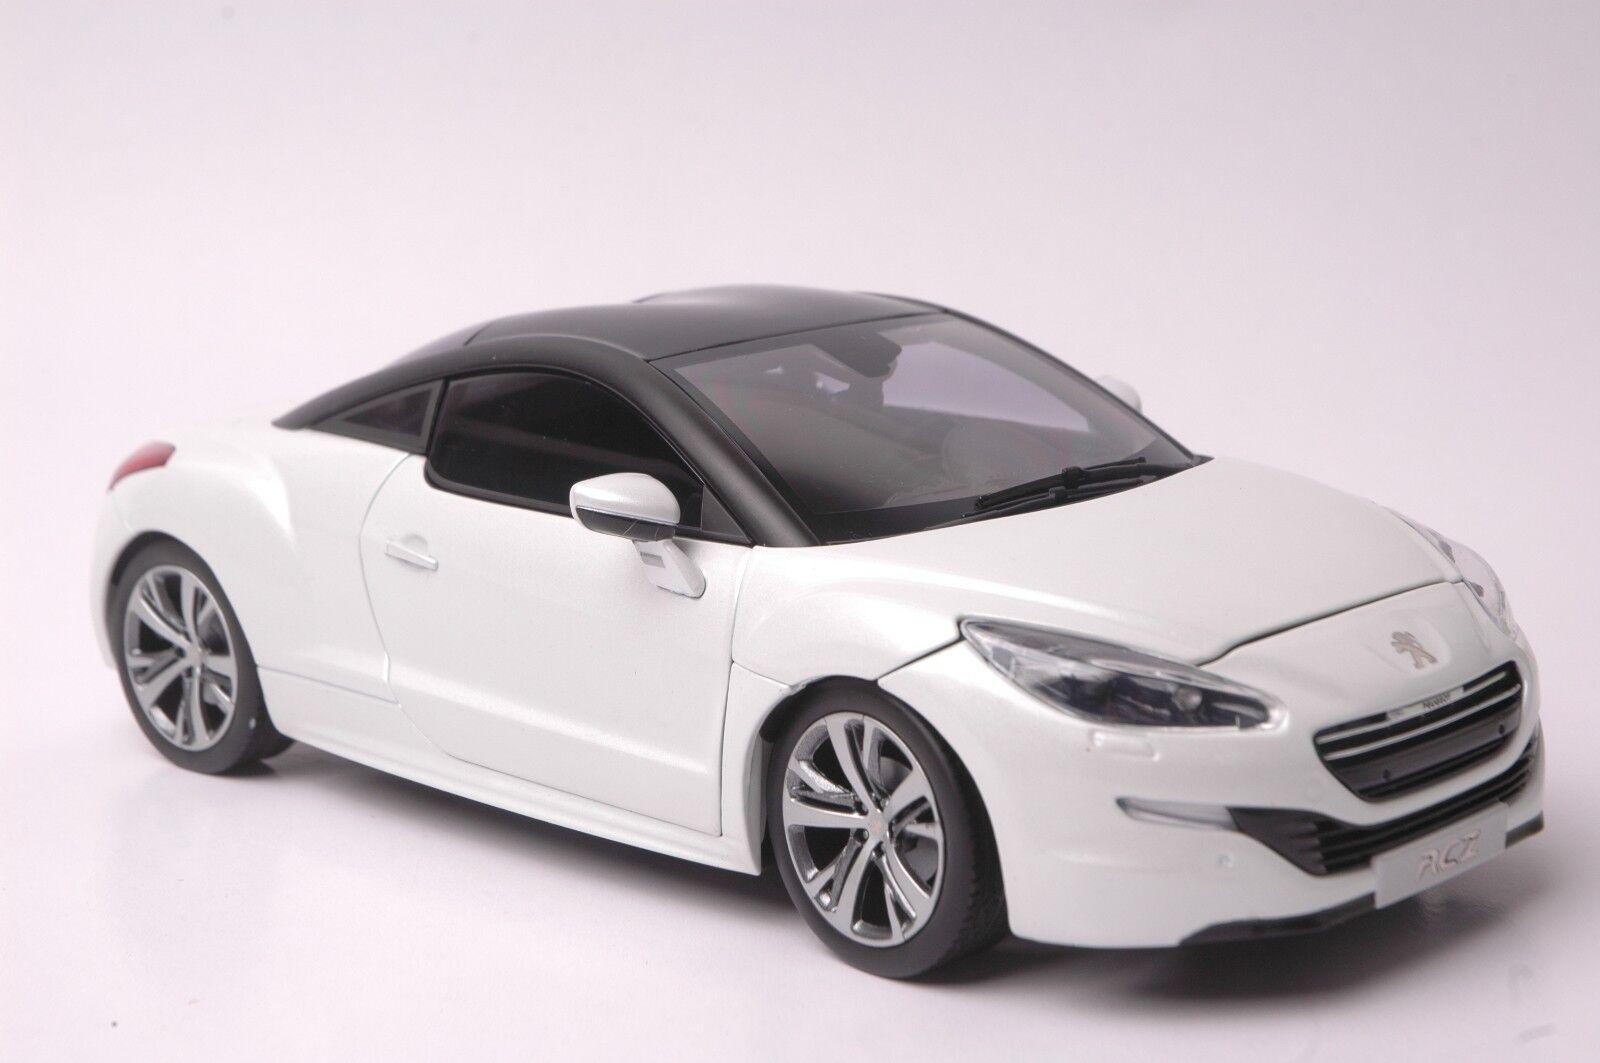 envío gratis Peugeot RCZ 2012 coche modelo en en en escala 1 18 blancoo  80% de descuento